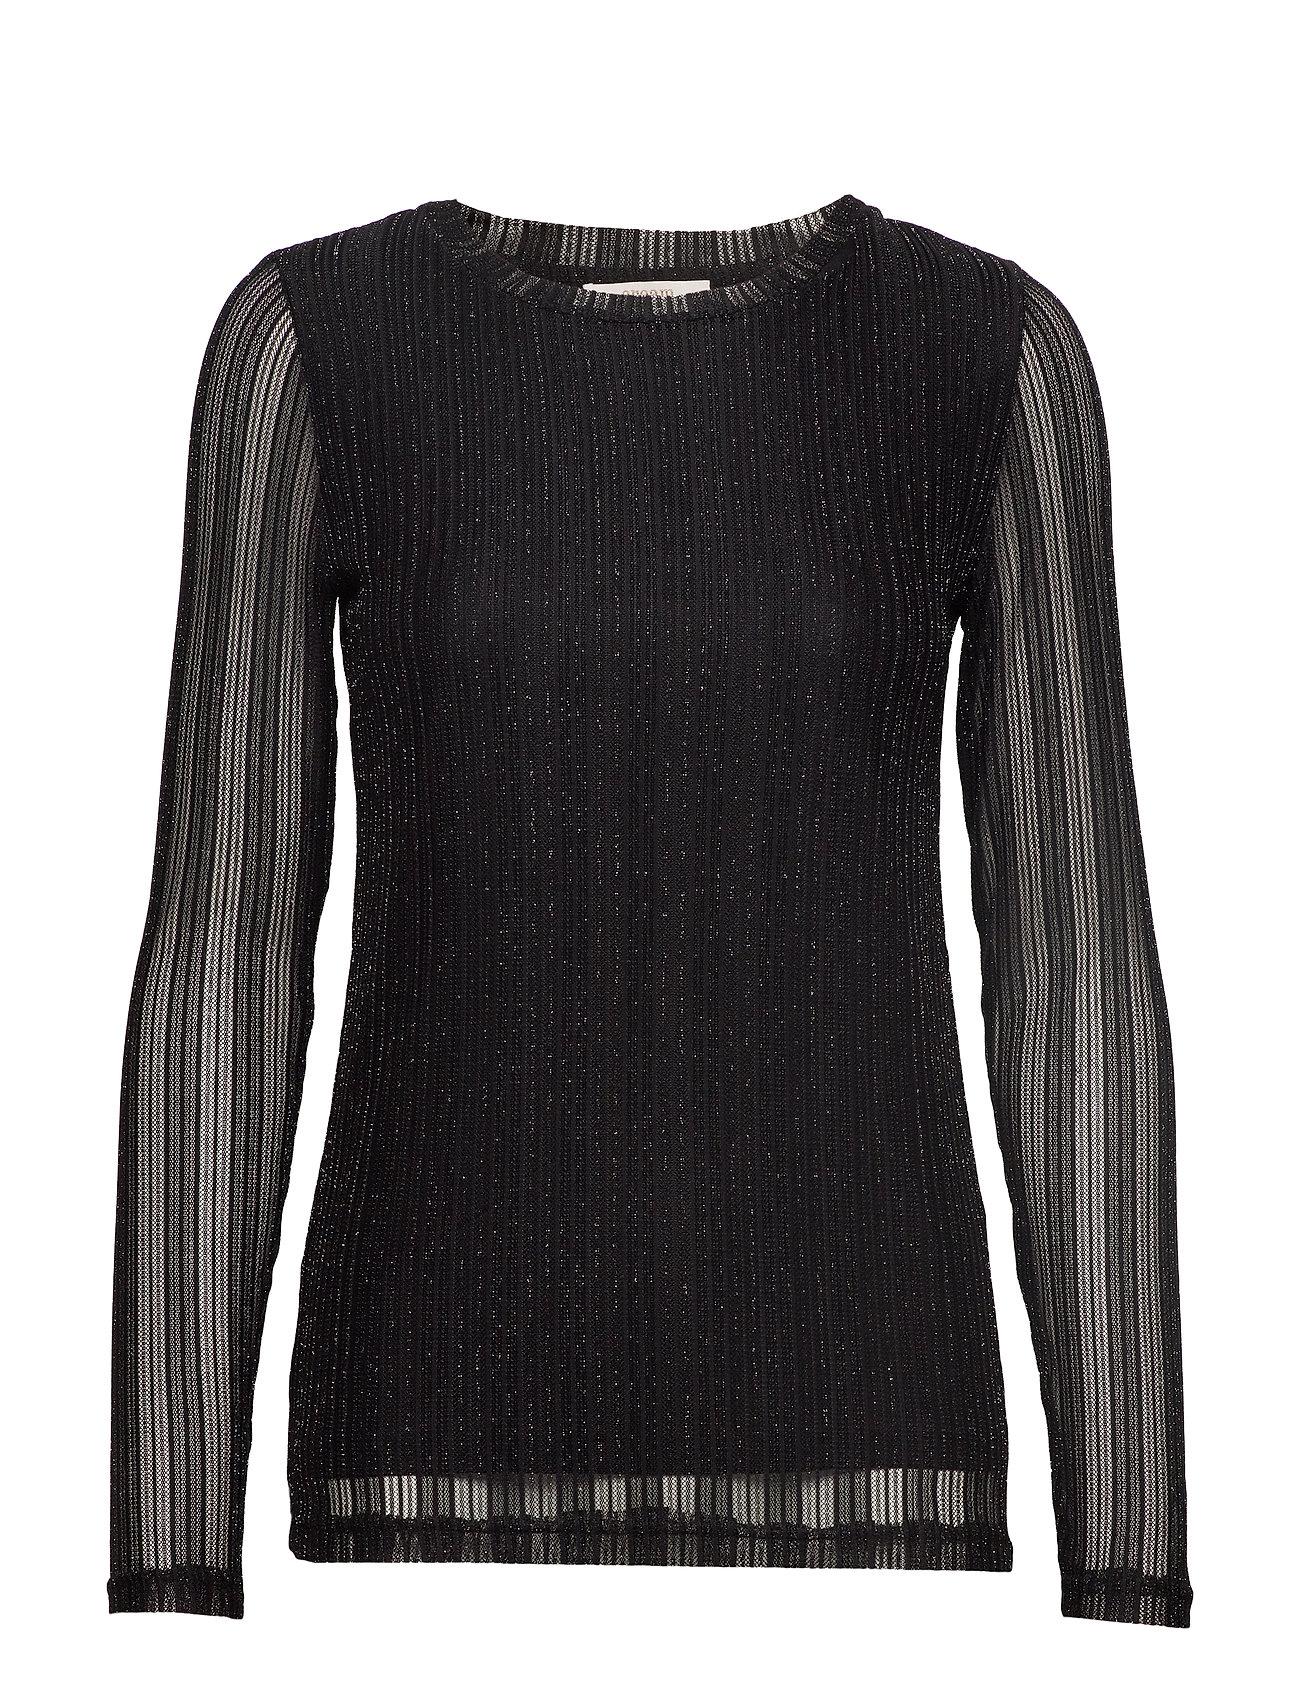 Cream ZoeCR Long Sleeve T-shirt - PITCH BLACK